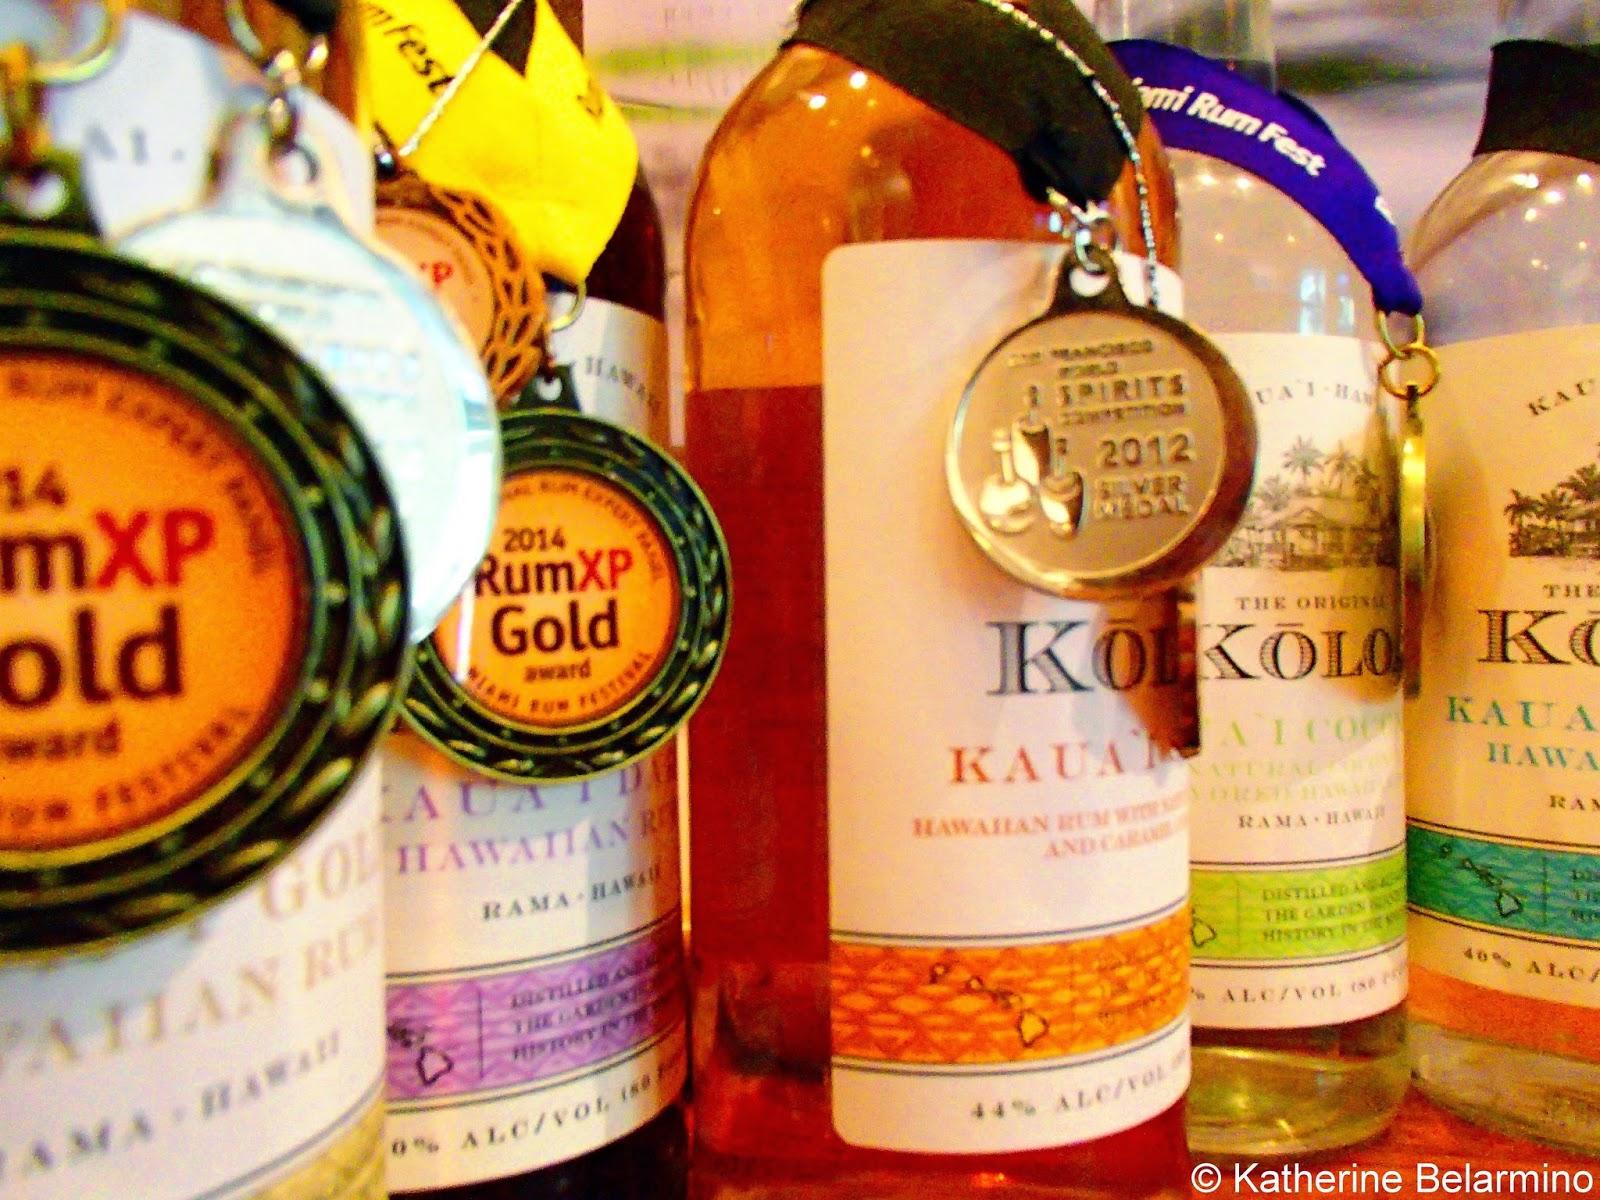 Award Winning Koloa Rum Company Rum Kauai Hawaii